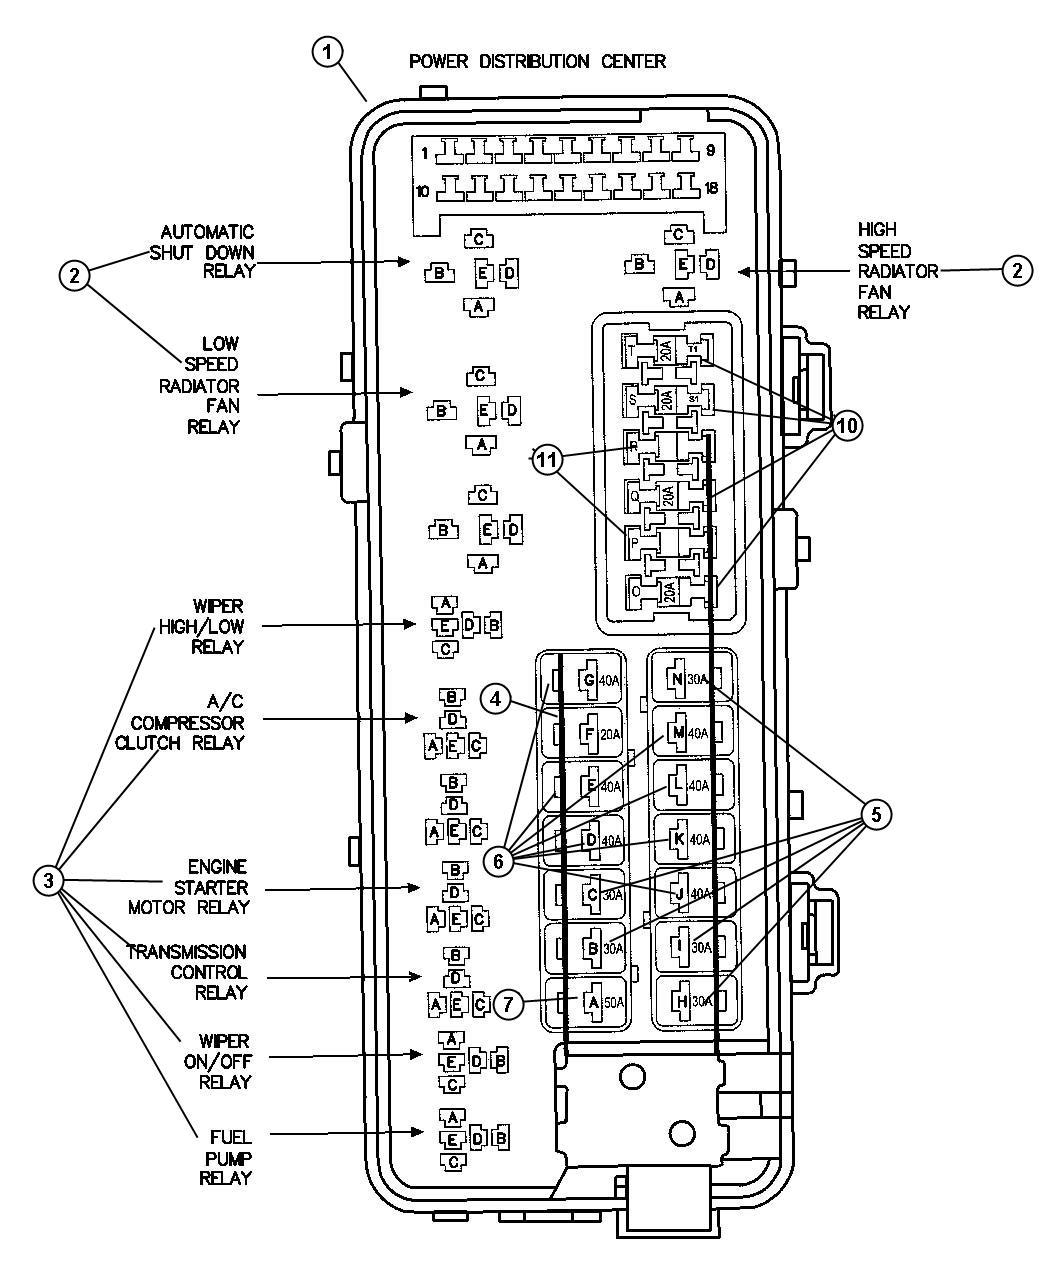 2003 Chrysler Concorde Wiring Diagram Wiring Diagram Modernize Modernize Frankmotors Es